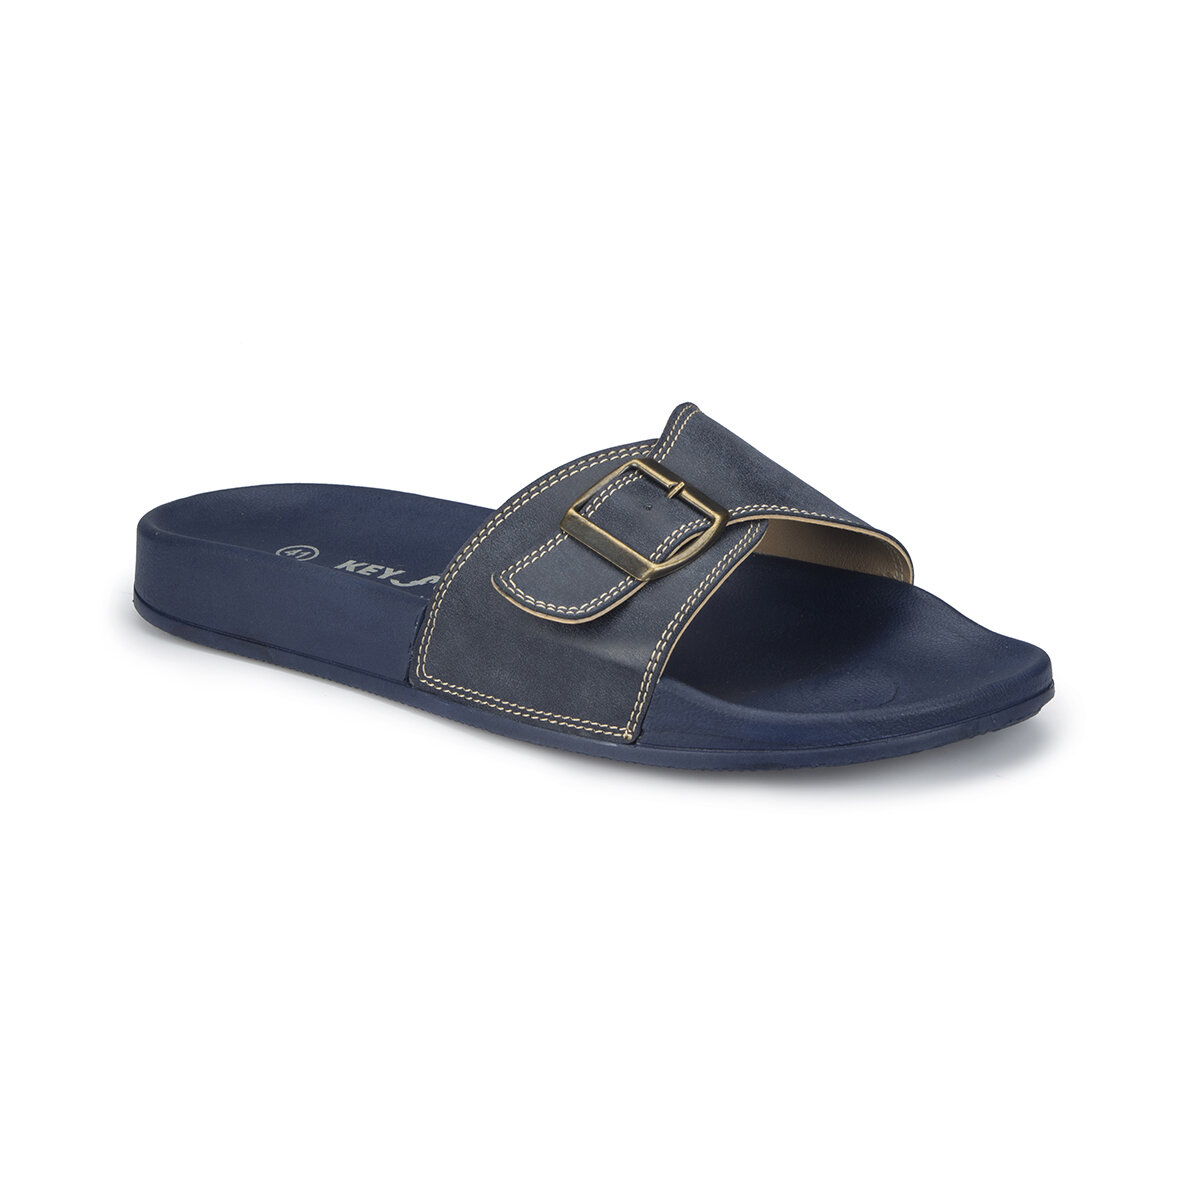 FLO 81.452198.M Navy Blue Male Slippers Polaris